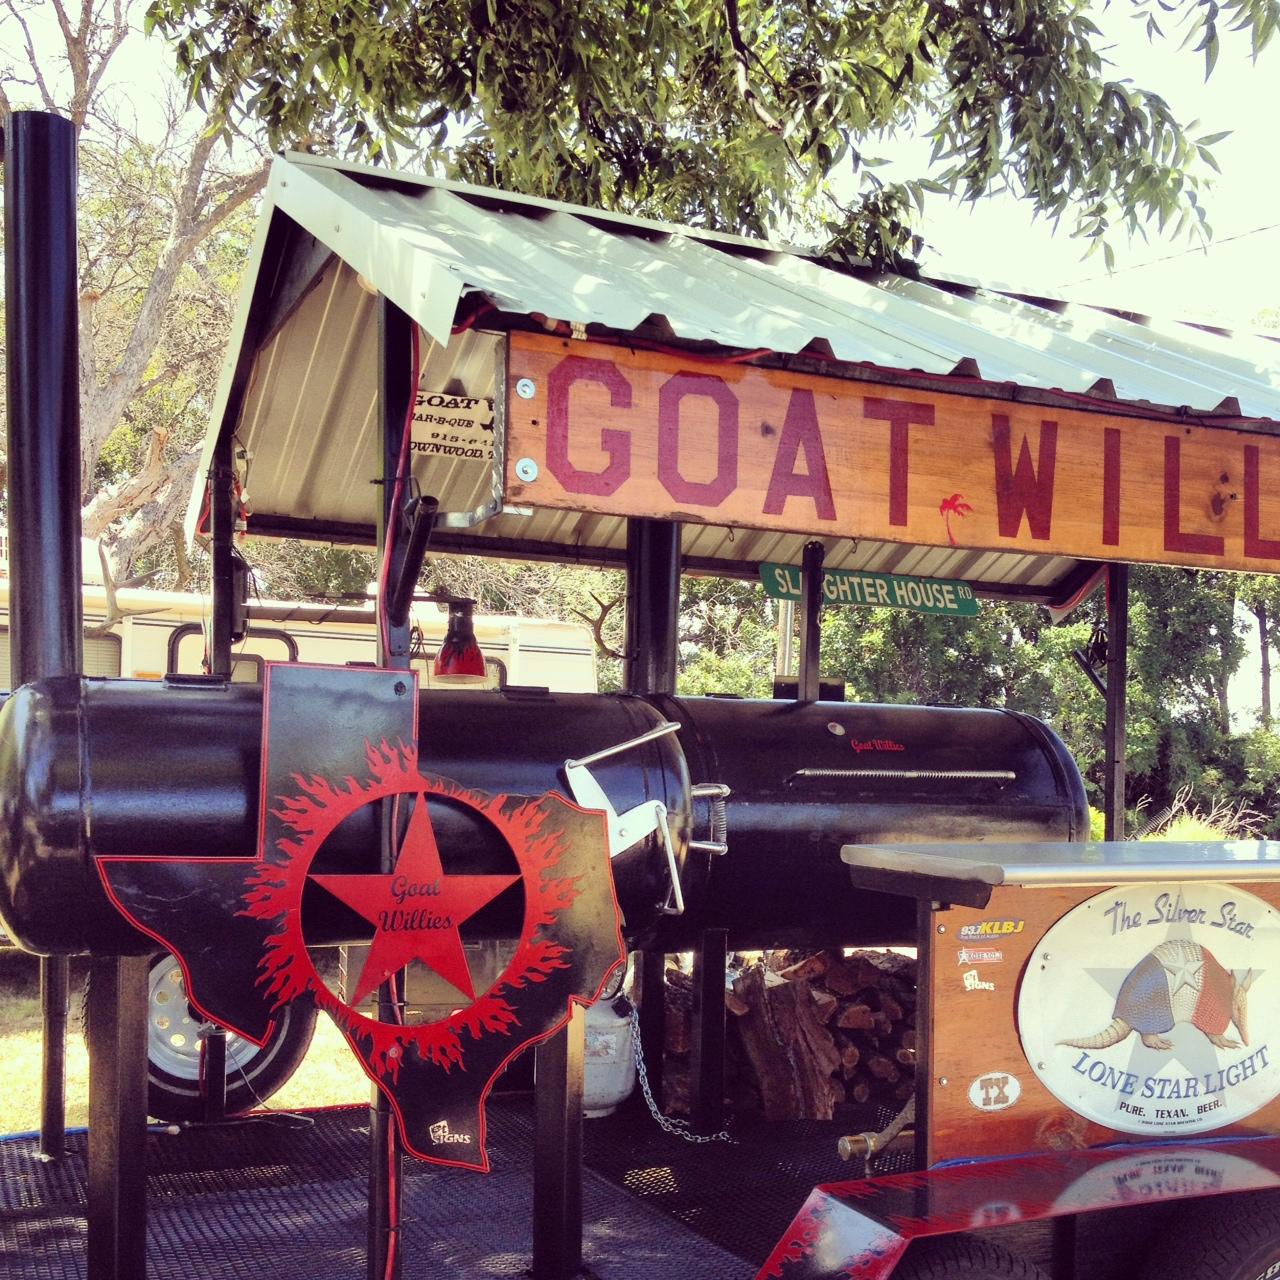 Goat Willies BBQ Goat